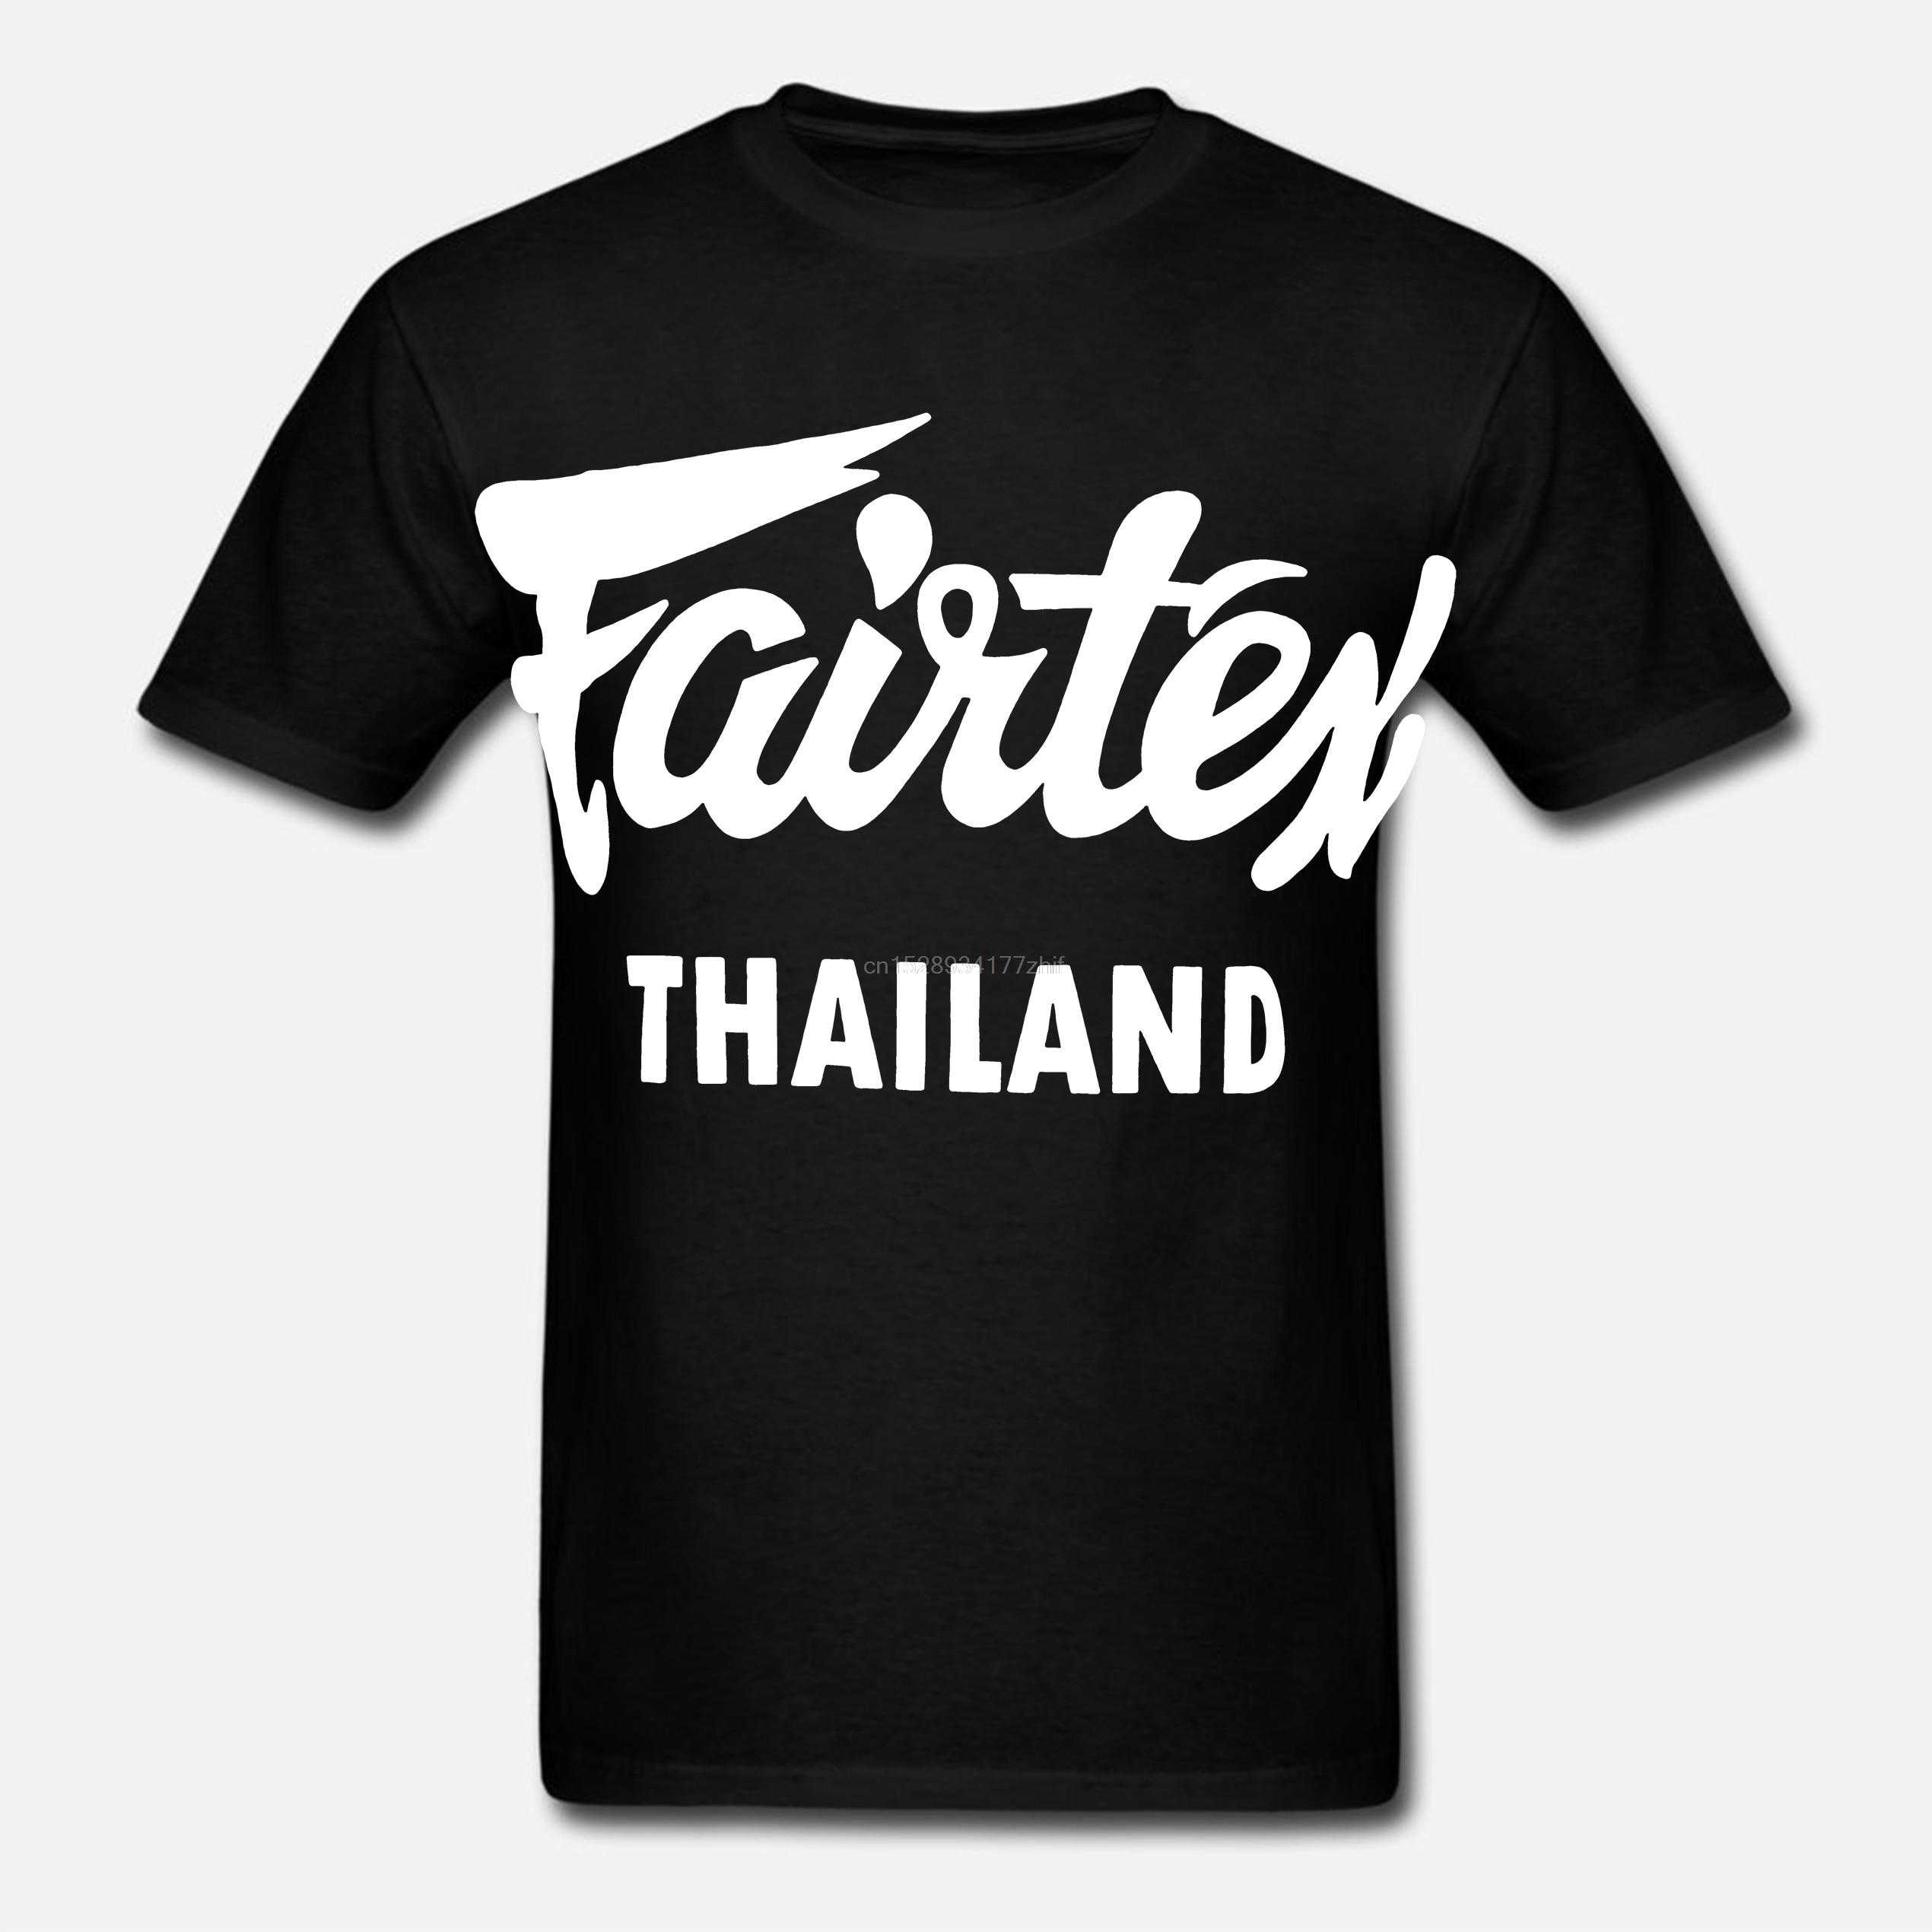 Fairtex Thailand T-Shirt Black Casual Muay Thai Kickboxing Round Neck Loose Graphic Tee Size S-3xl